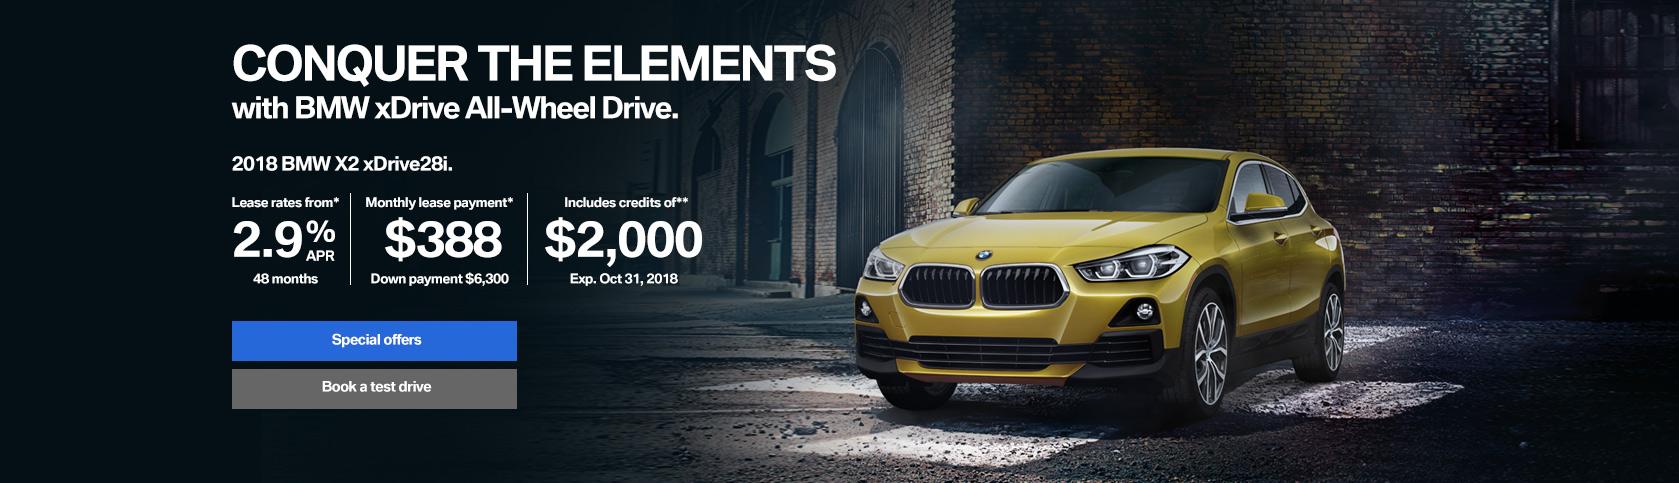 2018_BMW_OctDAG_X2_Banner_1679x483_GTA